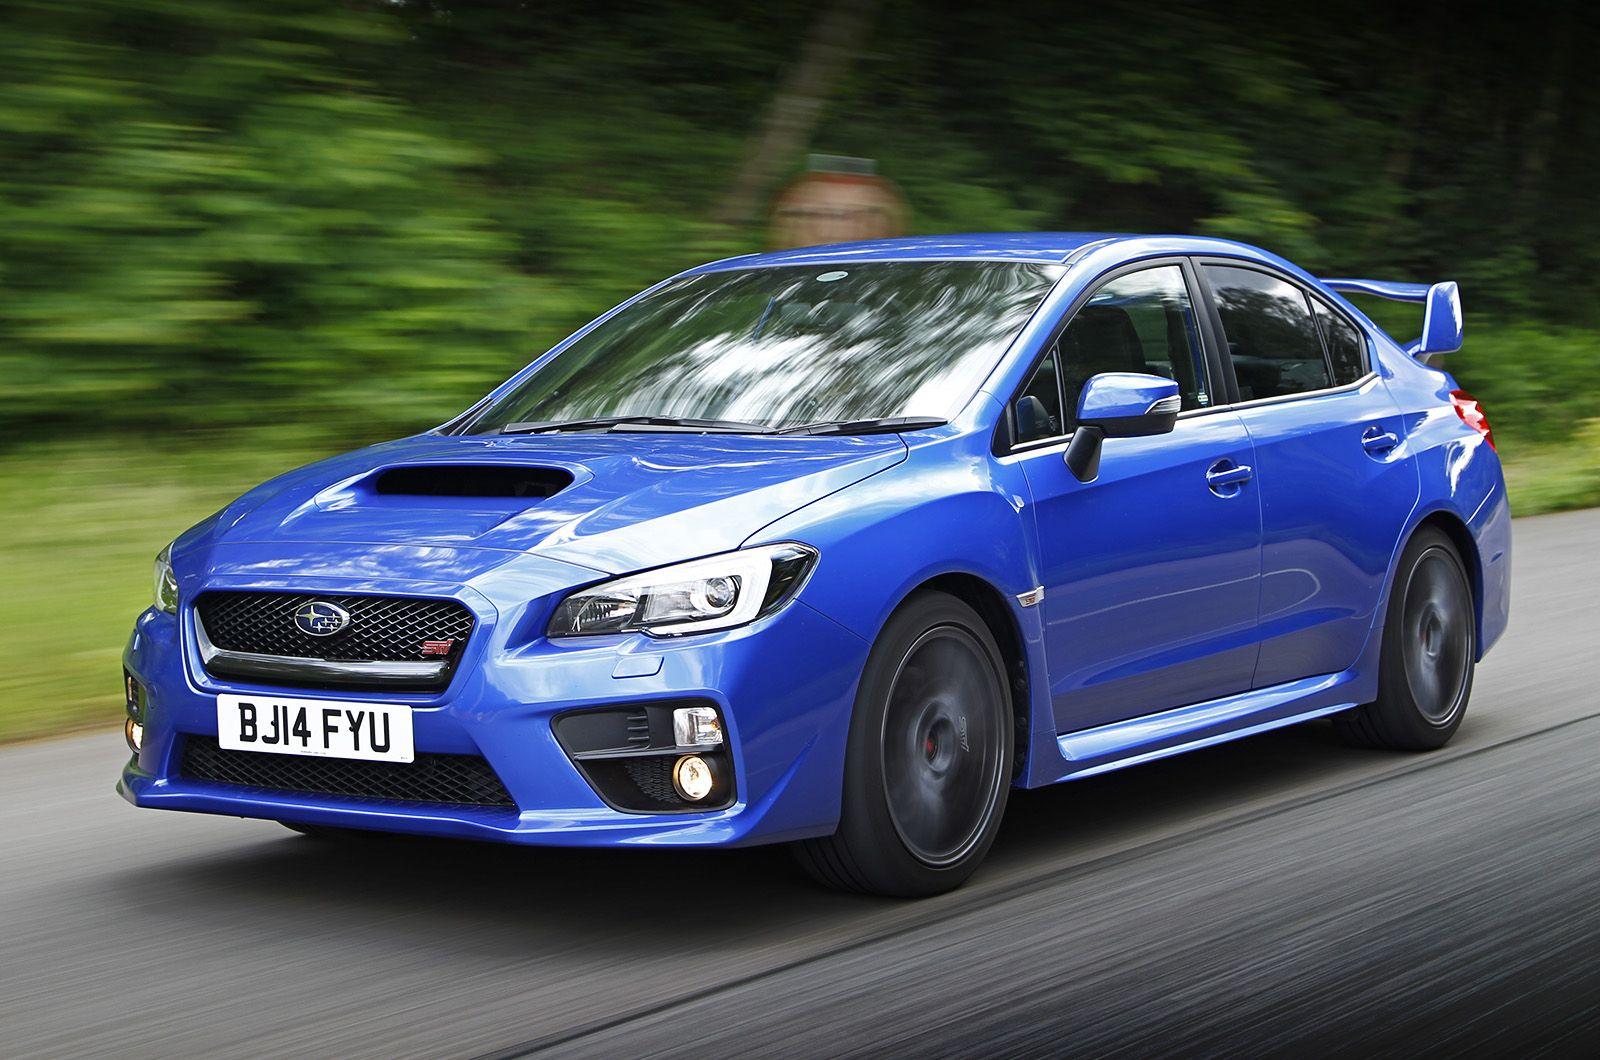 Subaru subaru pictures : Subaru | JDM | Pinterest | Subaru, Jdm and Cars